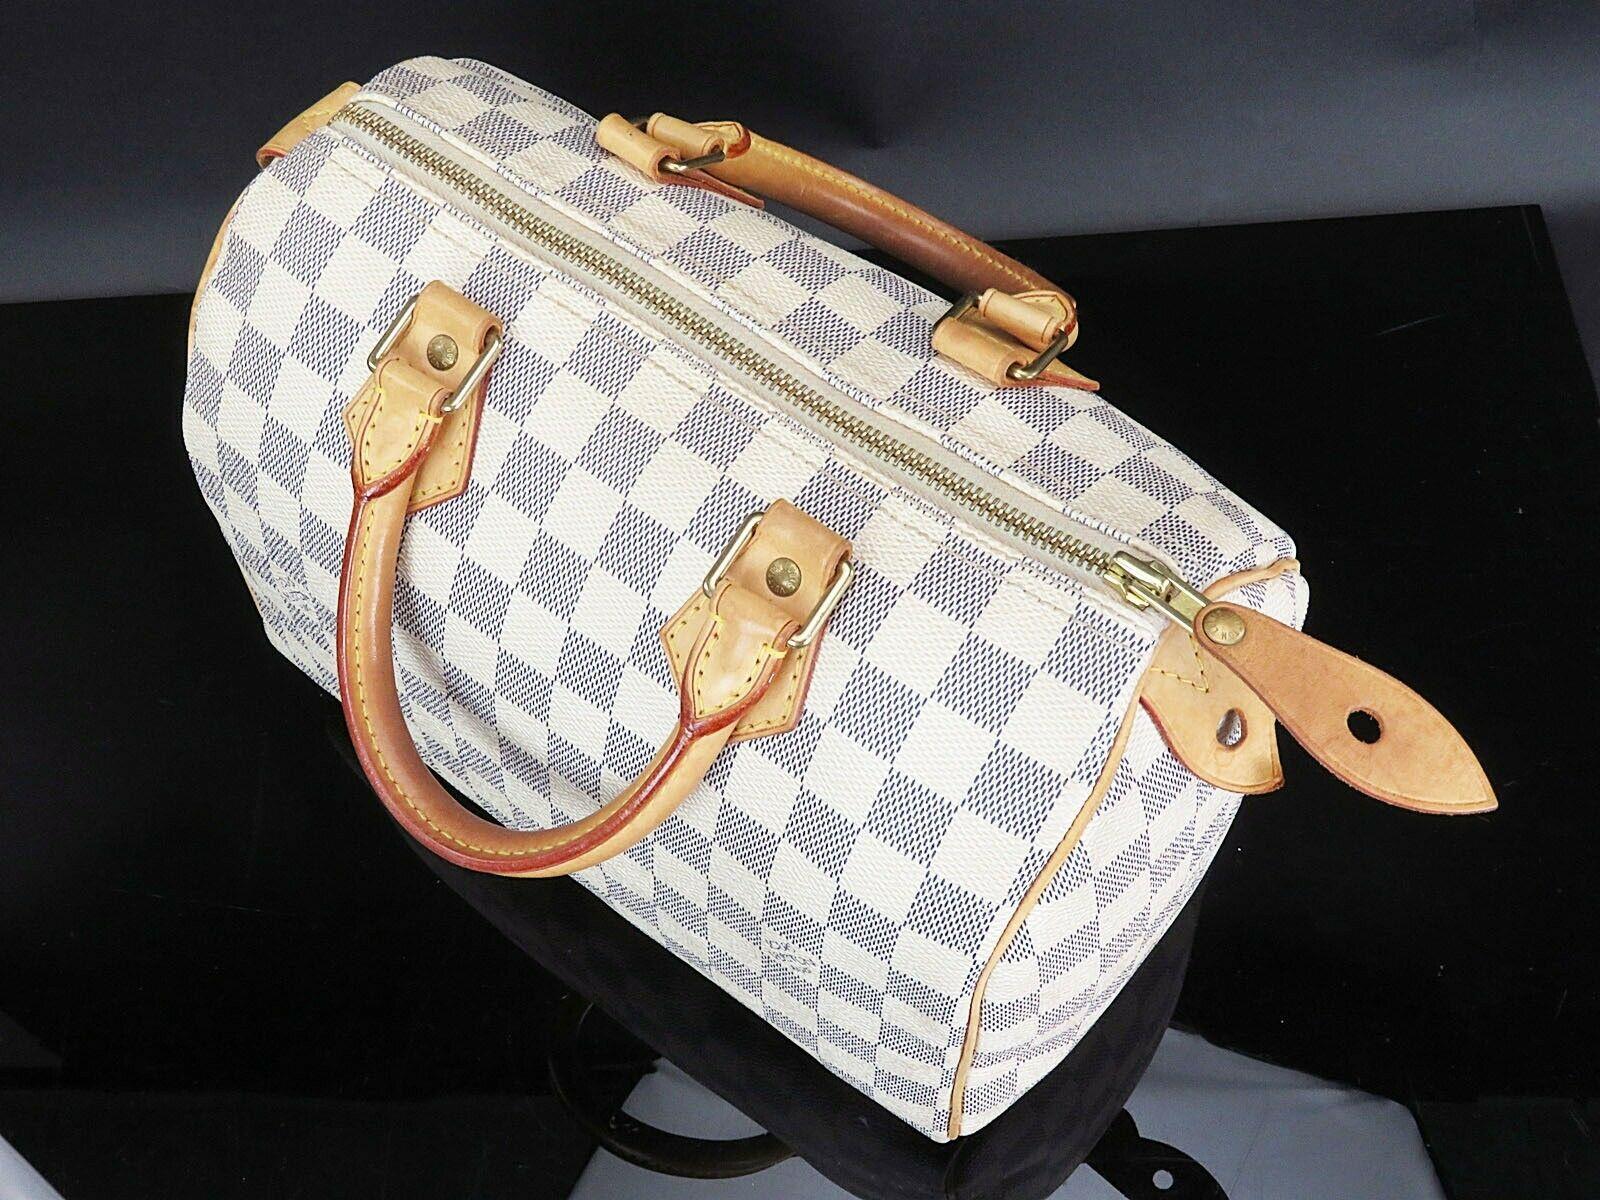 Authentic LOUIS VUITTON Speedy 25 Damier Azur Boston Hand Bag Purse #33078